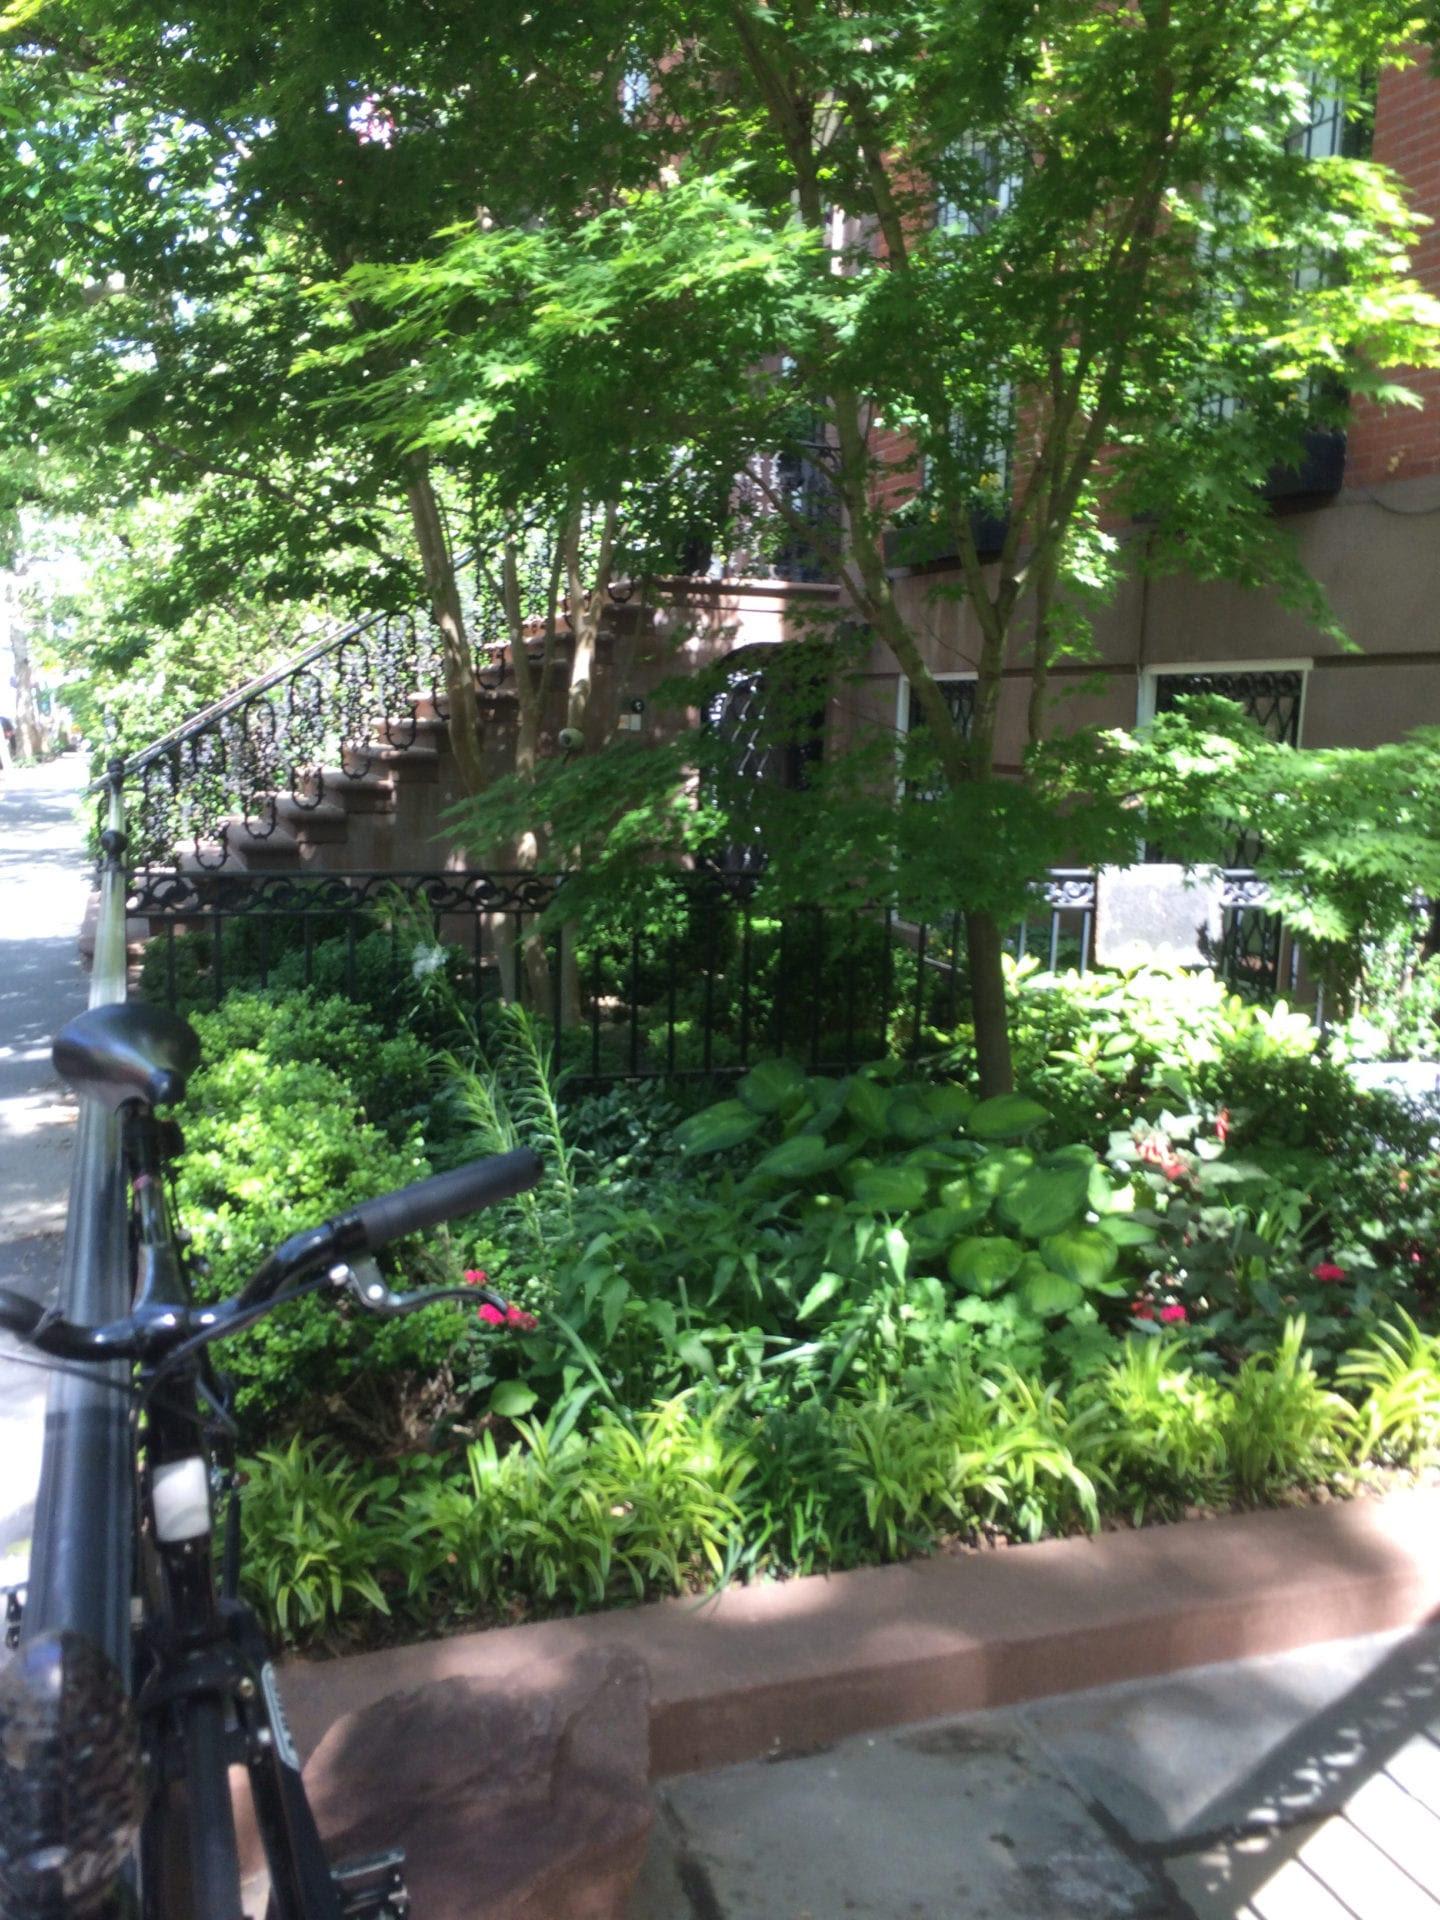 Were In A Tight Spot Landscape Design For Small Urban Spaces